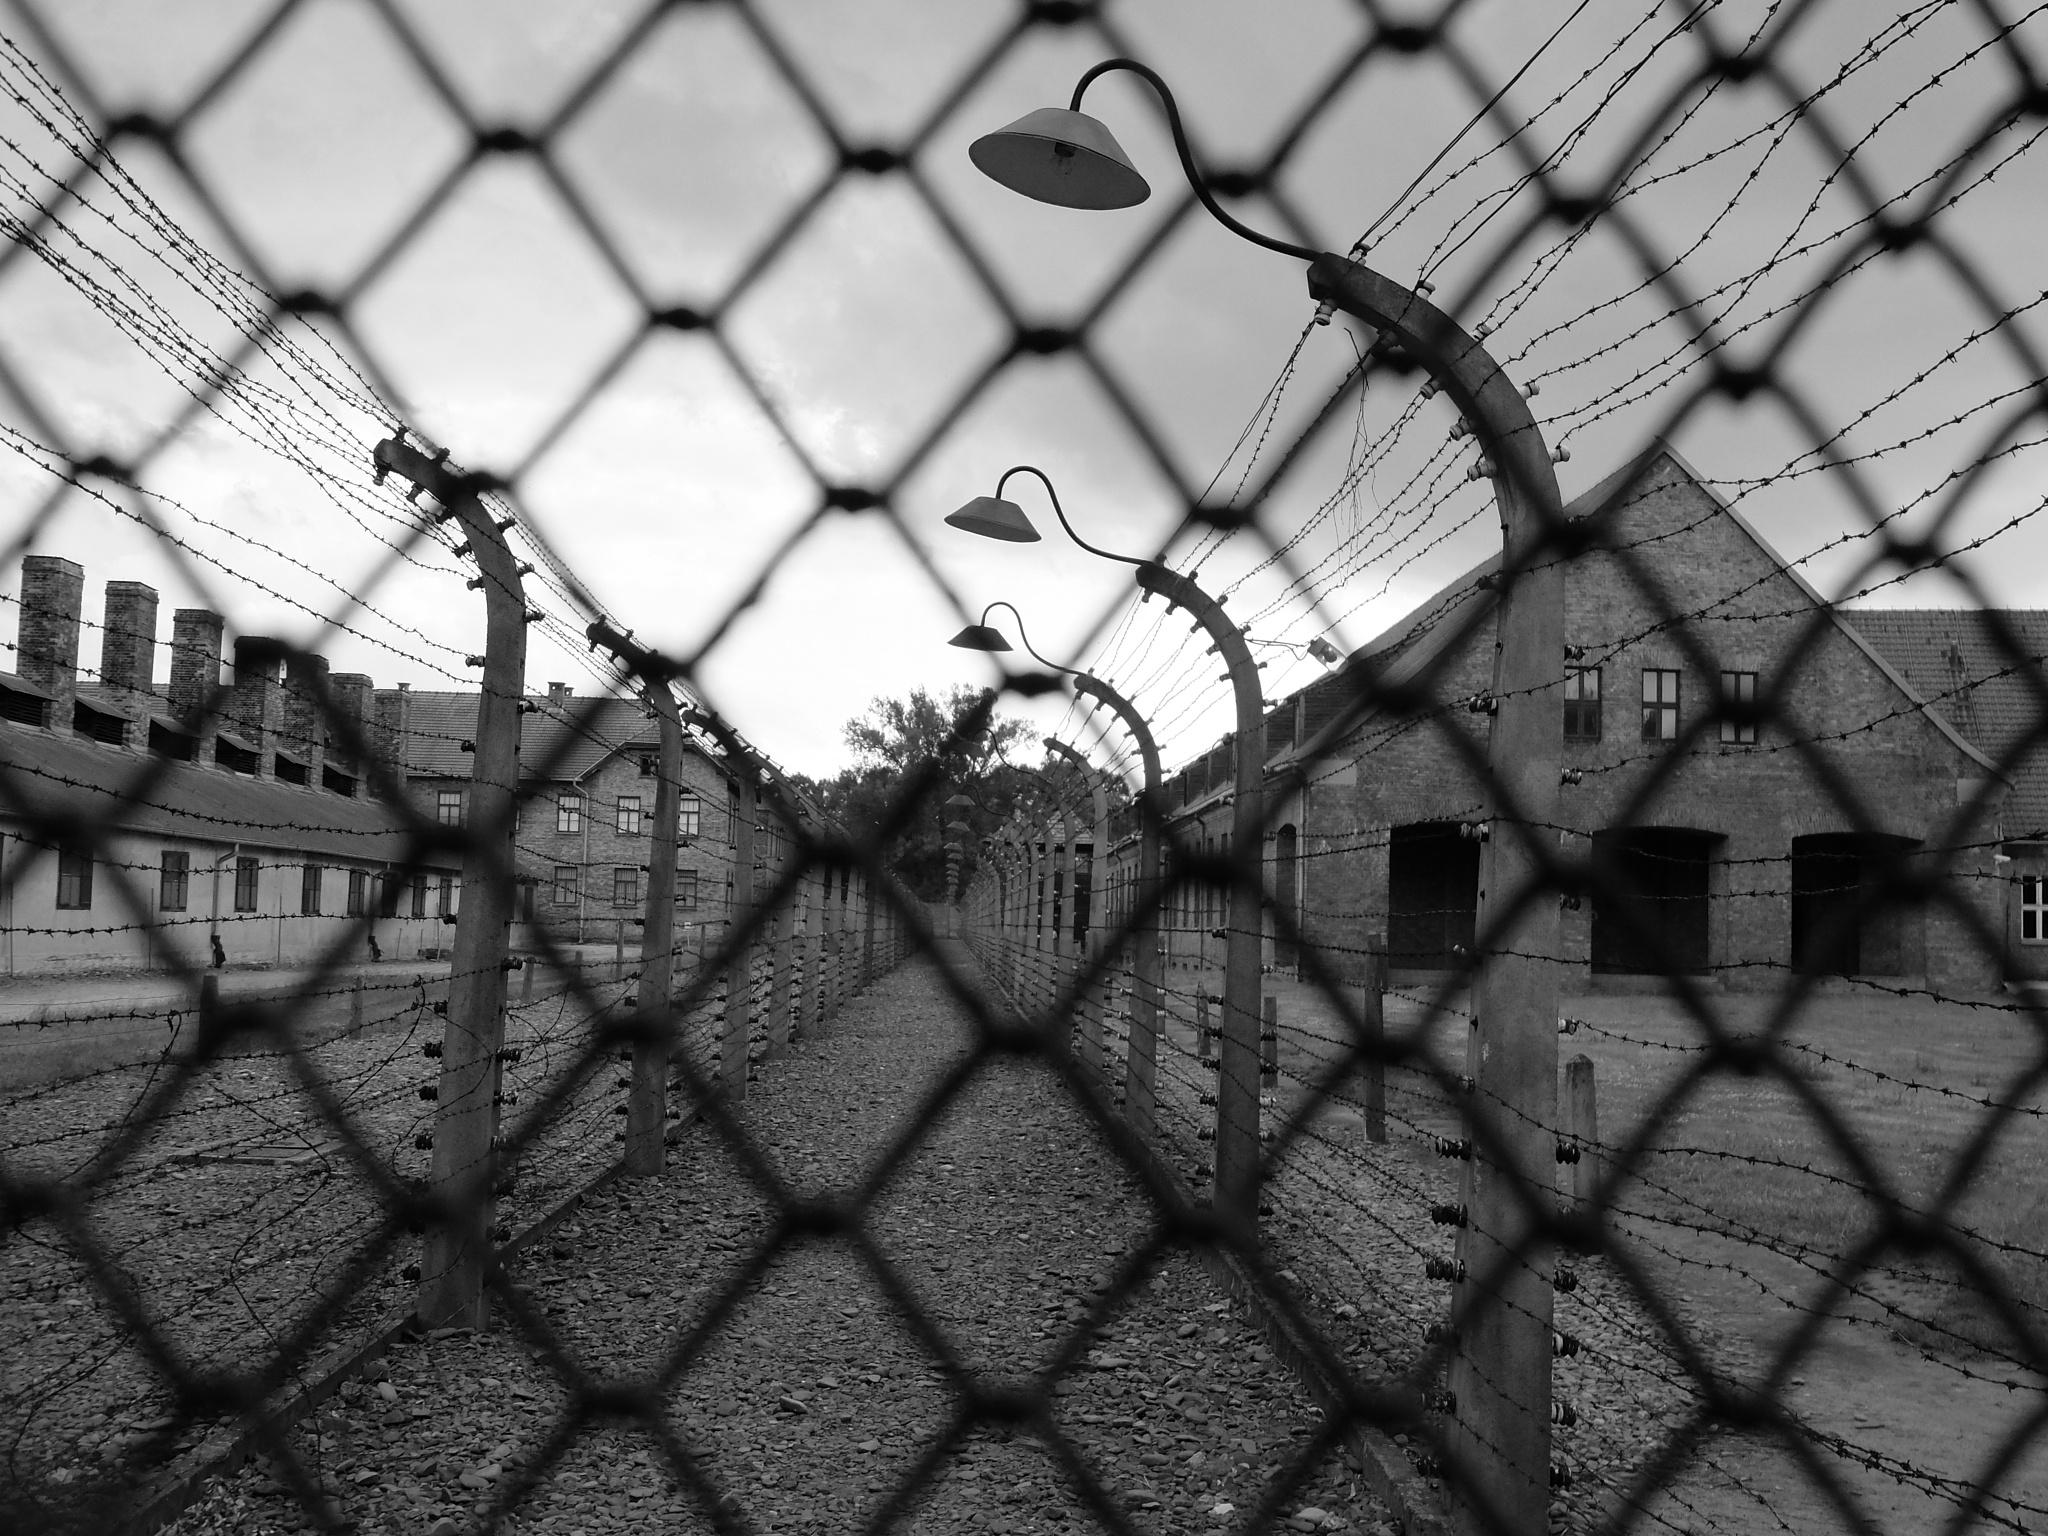 Auschwitz 2 by gigi.sorrentino1